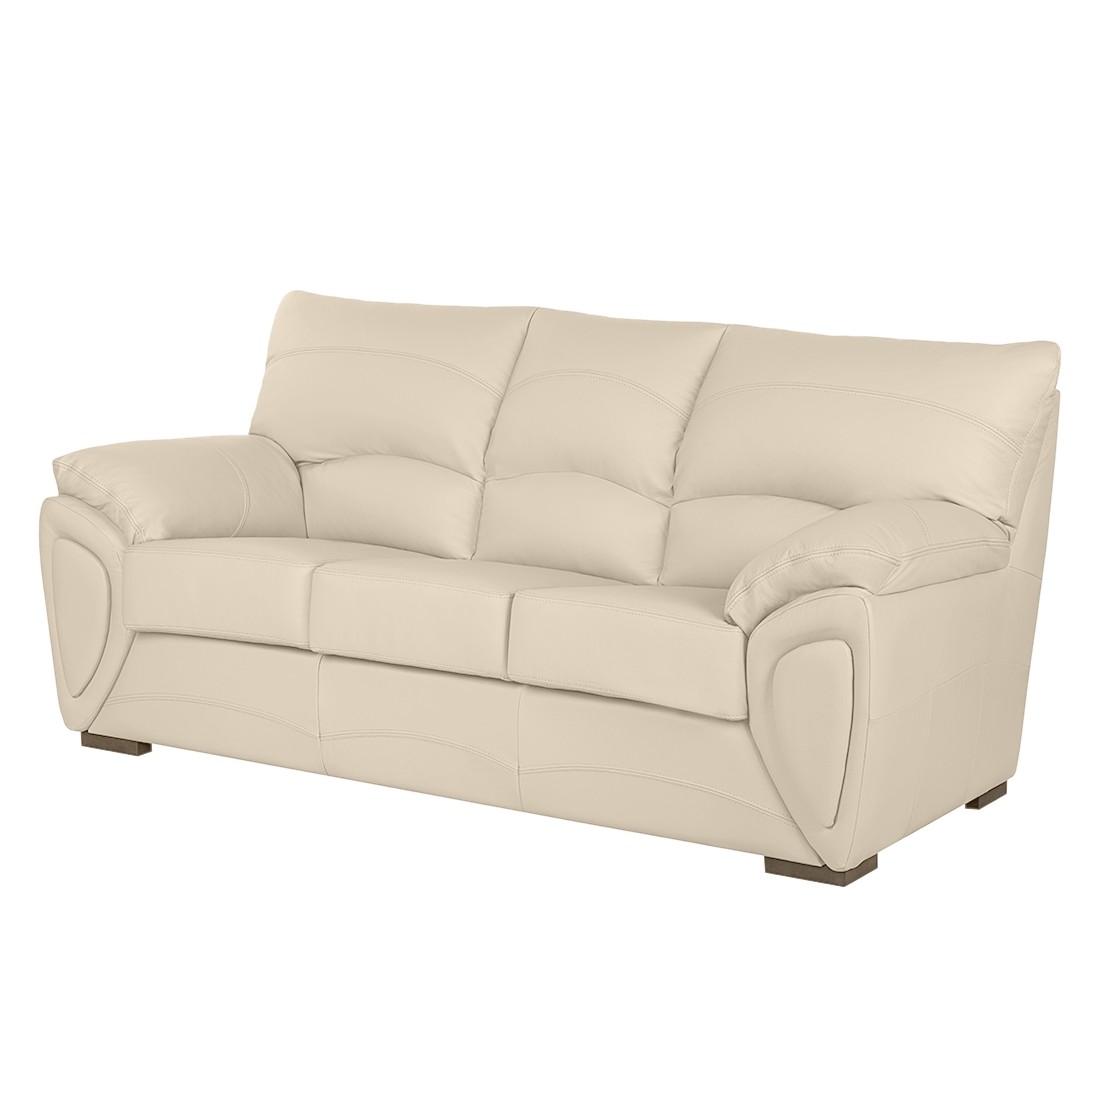 Sofa Luzzi (3-Sitzer) - Echtleder - Beige, Nuovoform